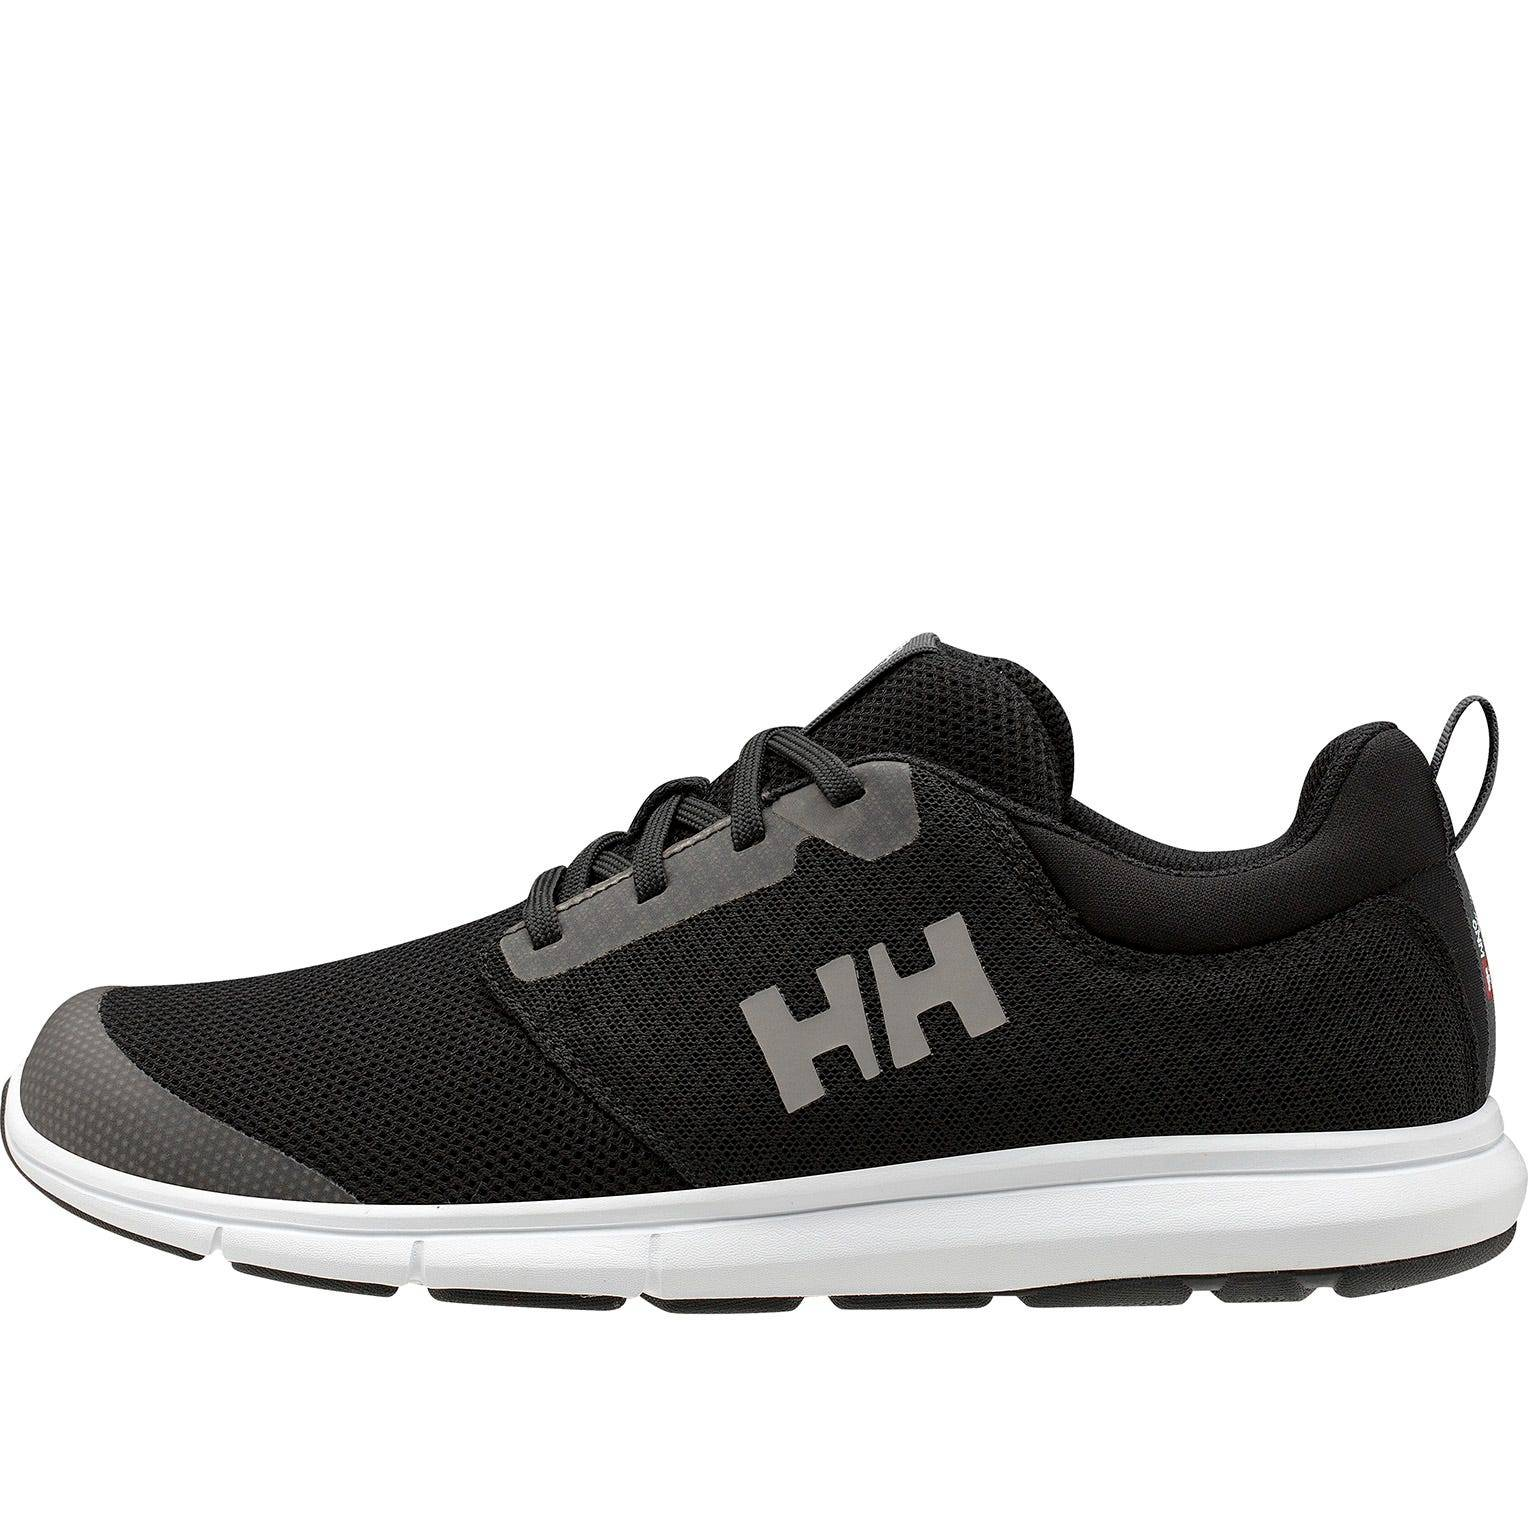 Helly Hansen Mens Feathering Sailing Shoe Black 8